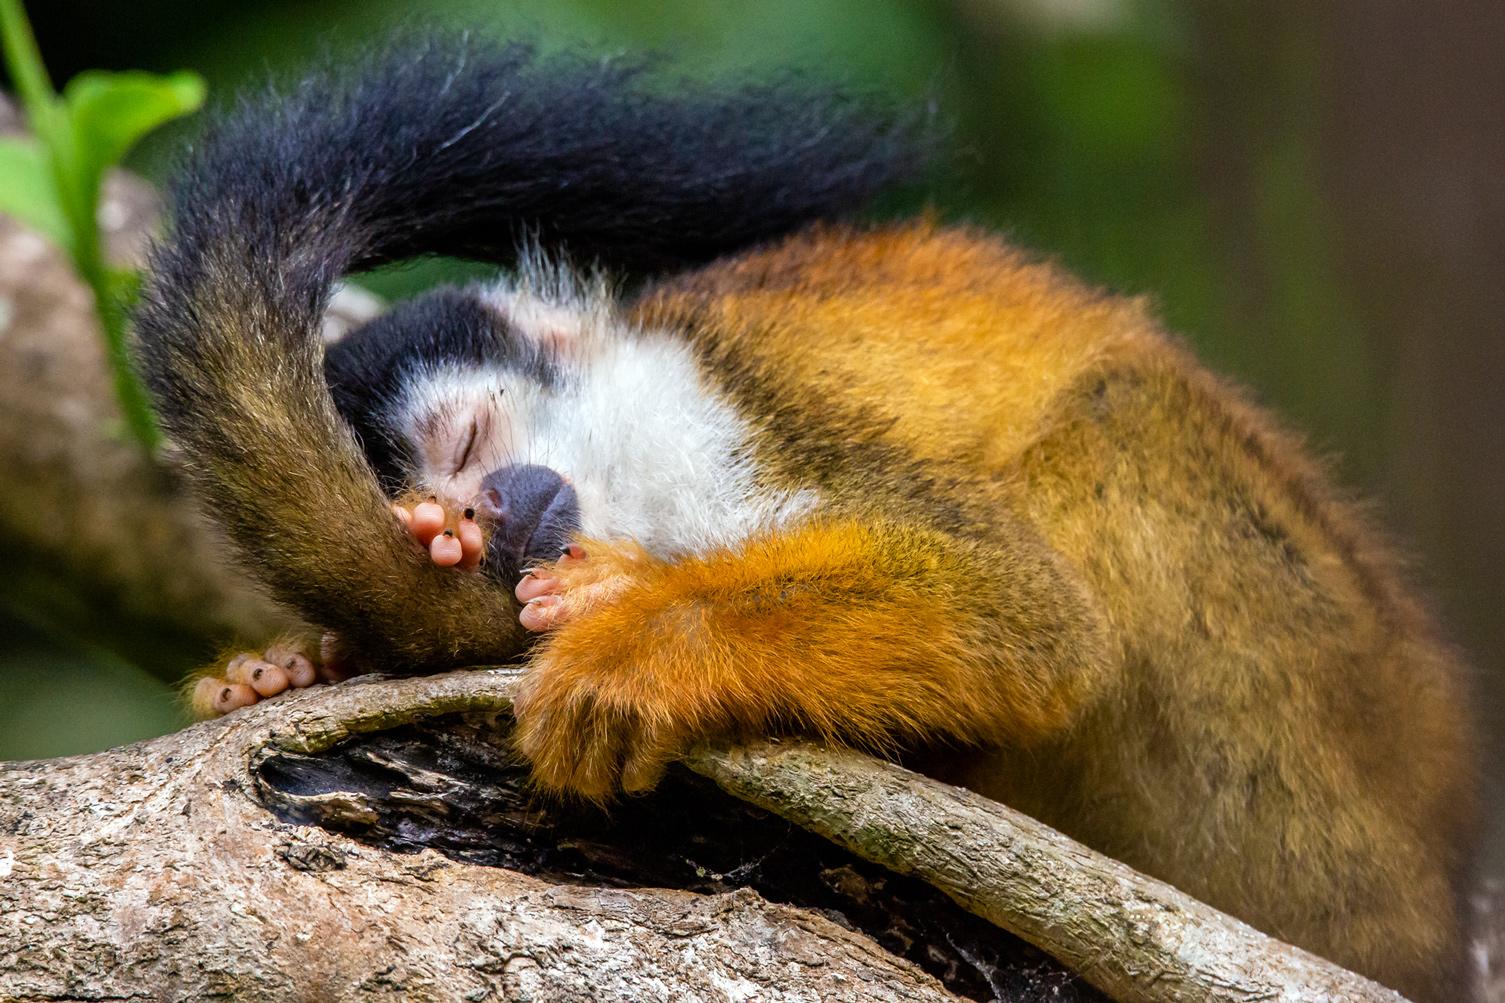 Sleepy Squirrel Monkey - Osa Peninsula